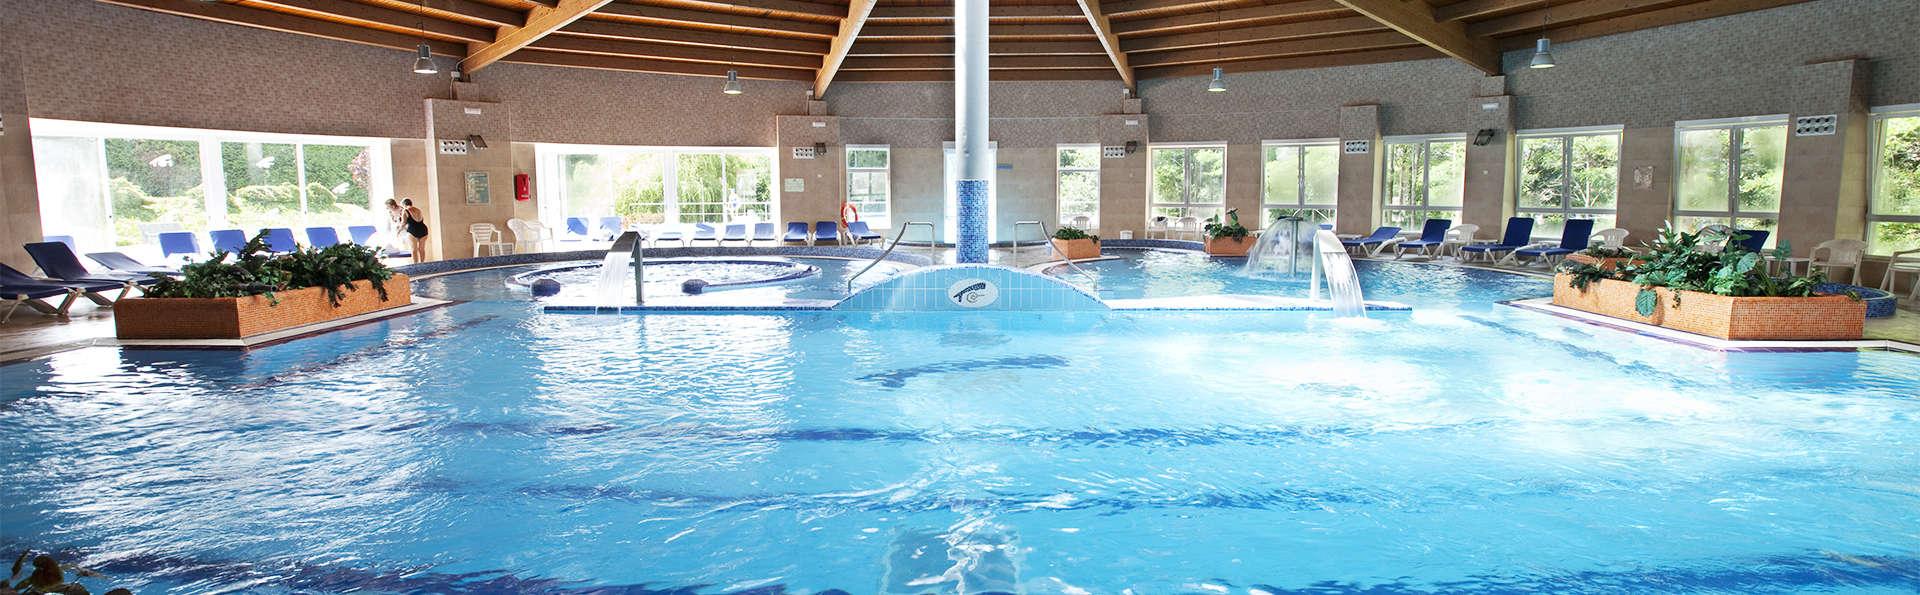 Hotel Castro Do Balneario - EDIT_pool4.jpg